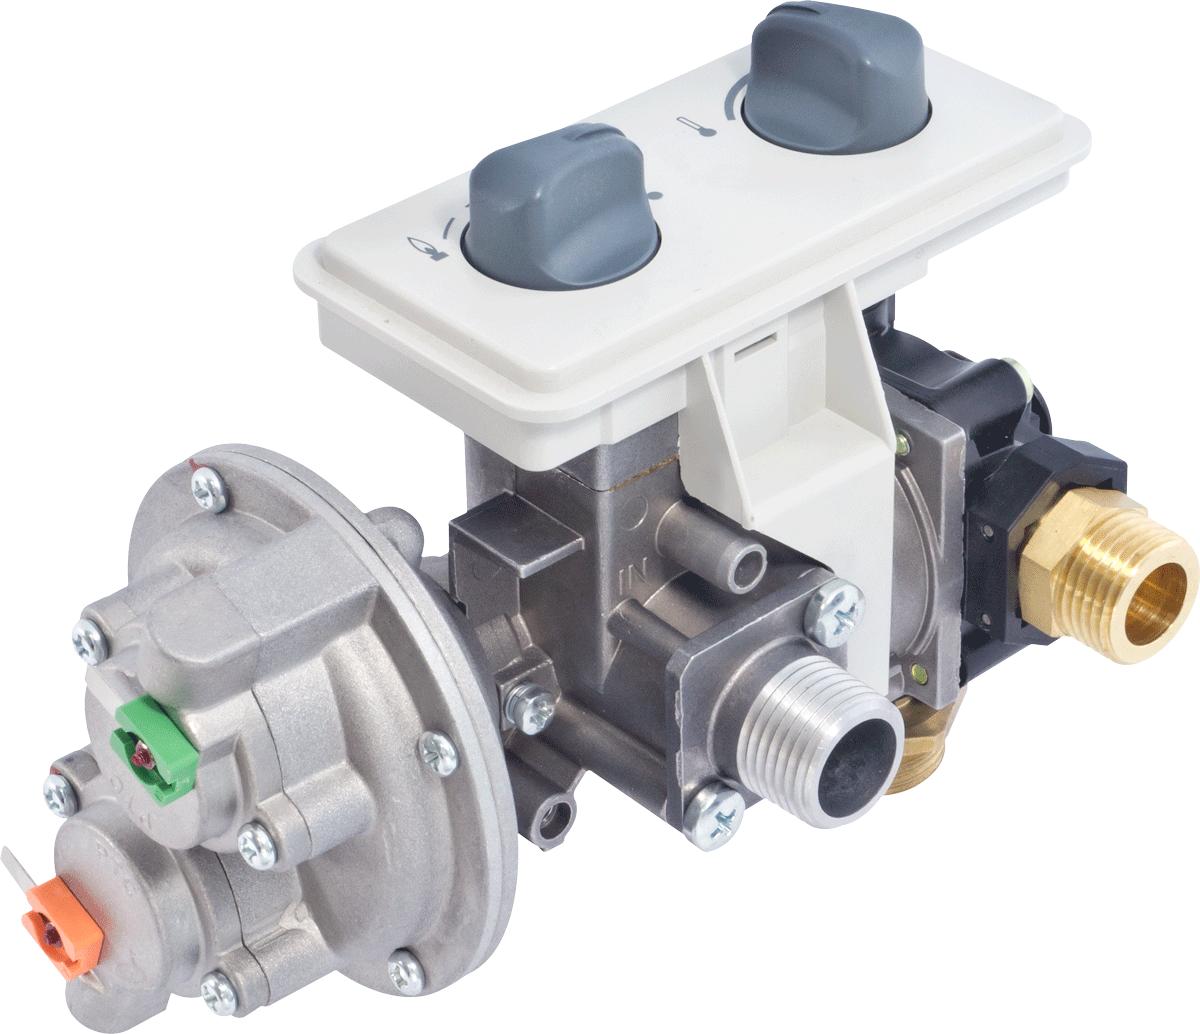 GW50B Gas-Water Combination Control